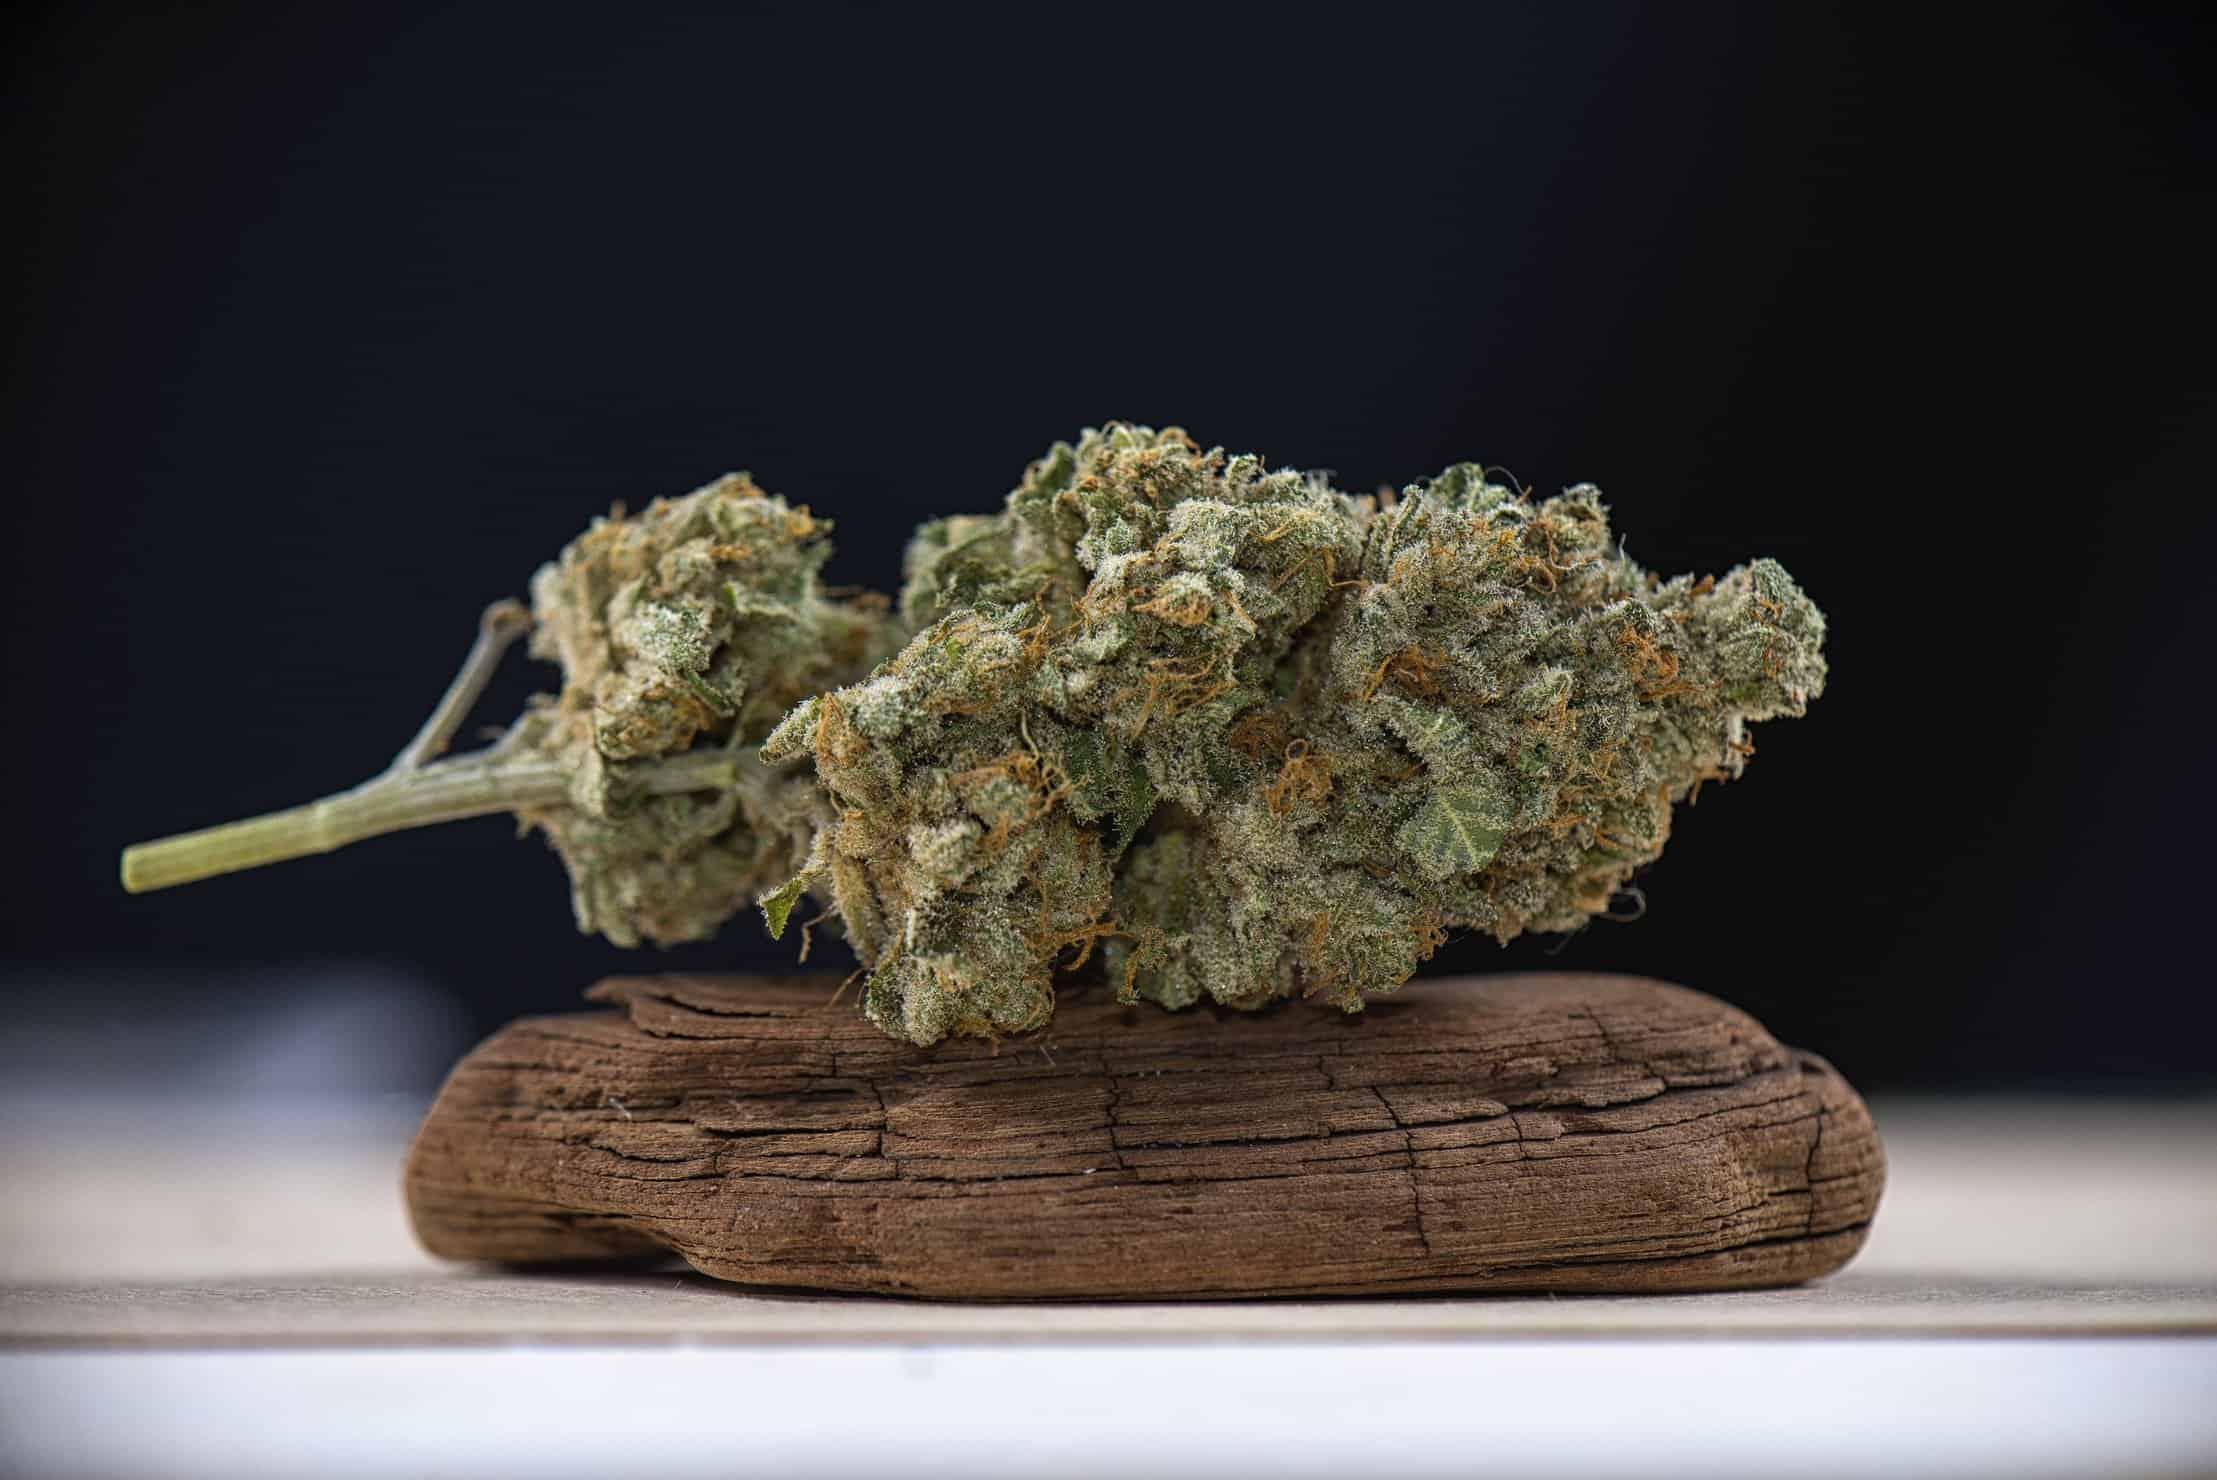 The history of marijuana in Islamic countries. Bud on a rock.